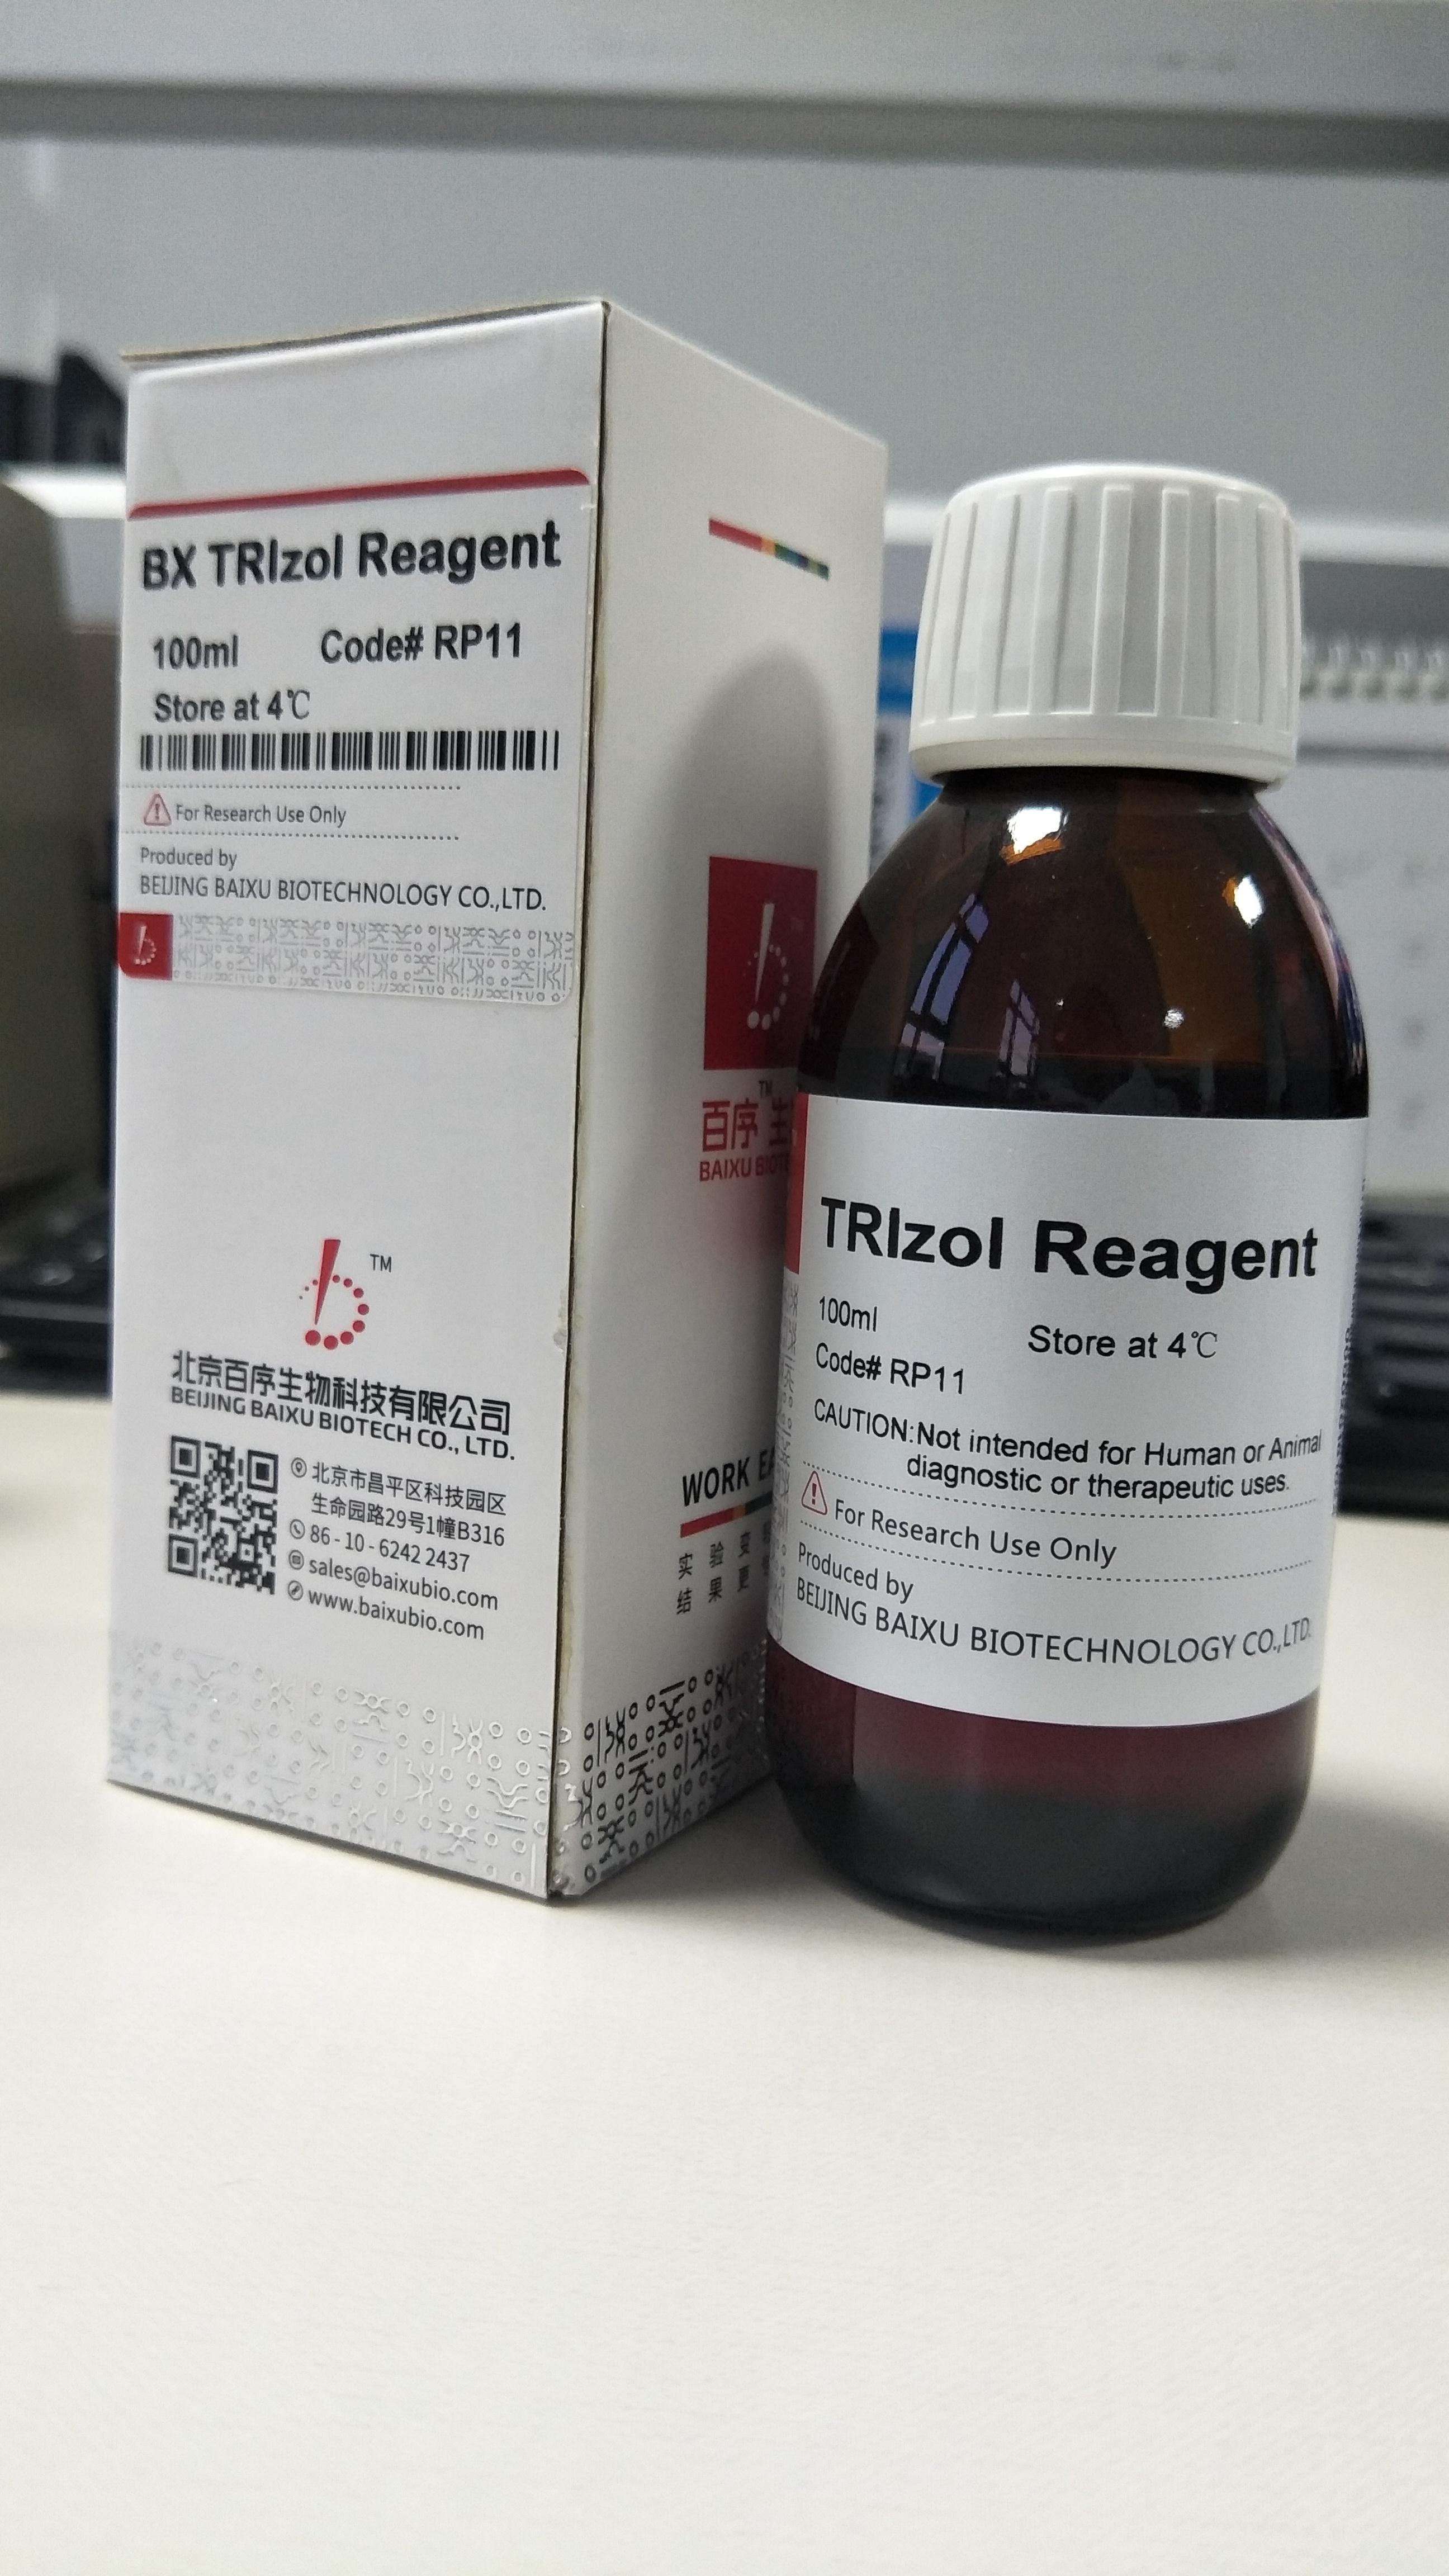 BX TRIzol Reagent (100ml)